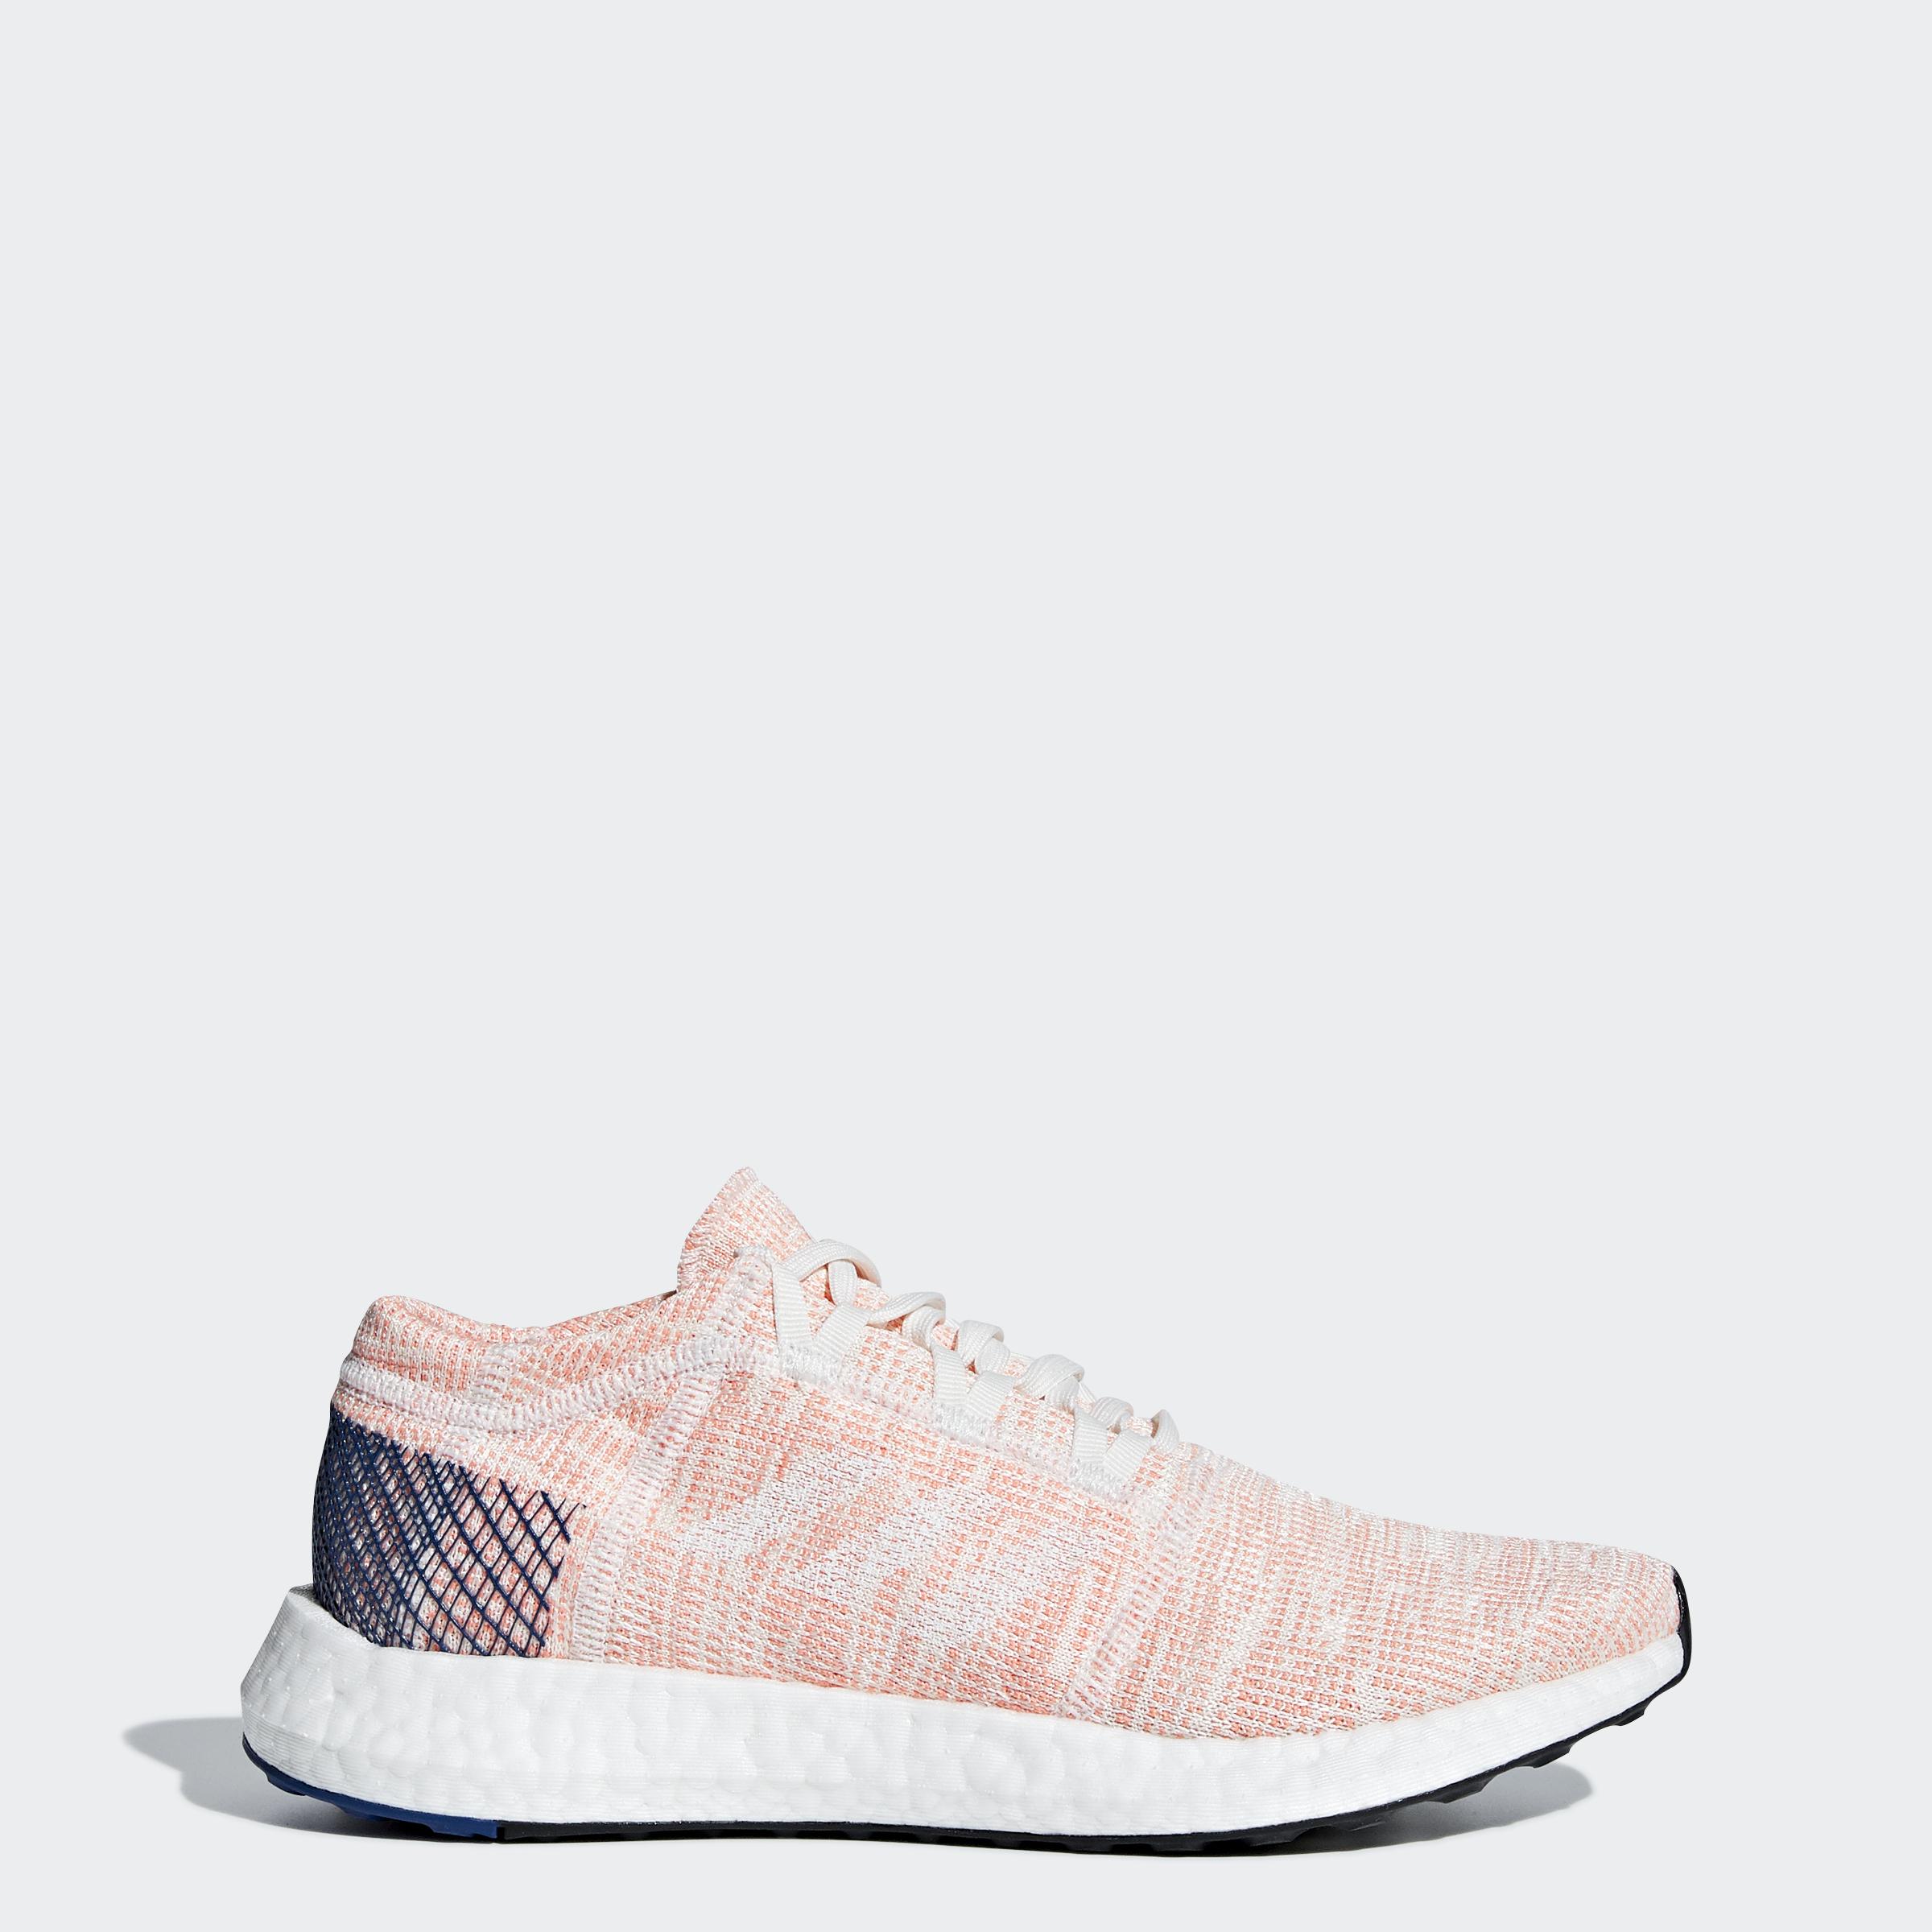 adidas Pureboost Go Shoes Womens